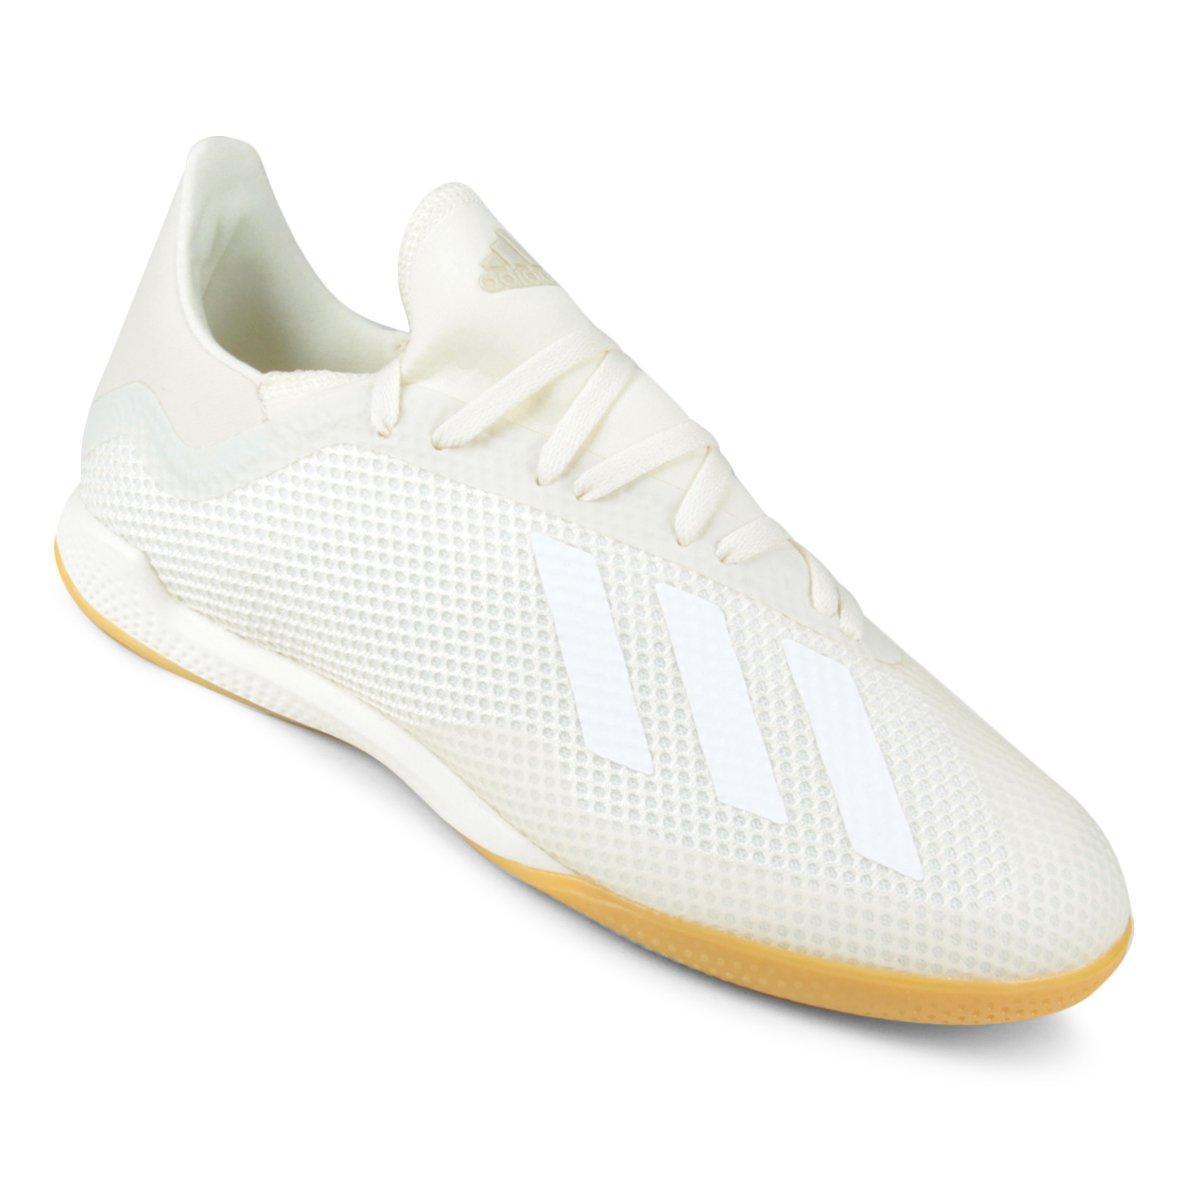 60d6b9d9ef55b Shopping Smiles - Chuteira Futsal Adidas X Tango 18 3 IN